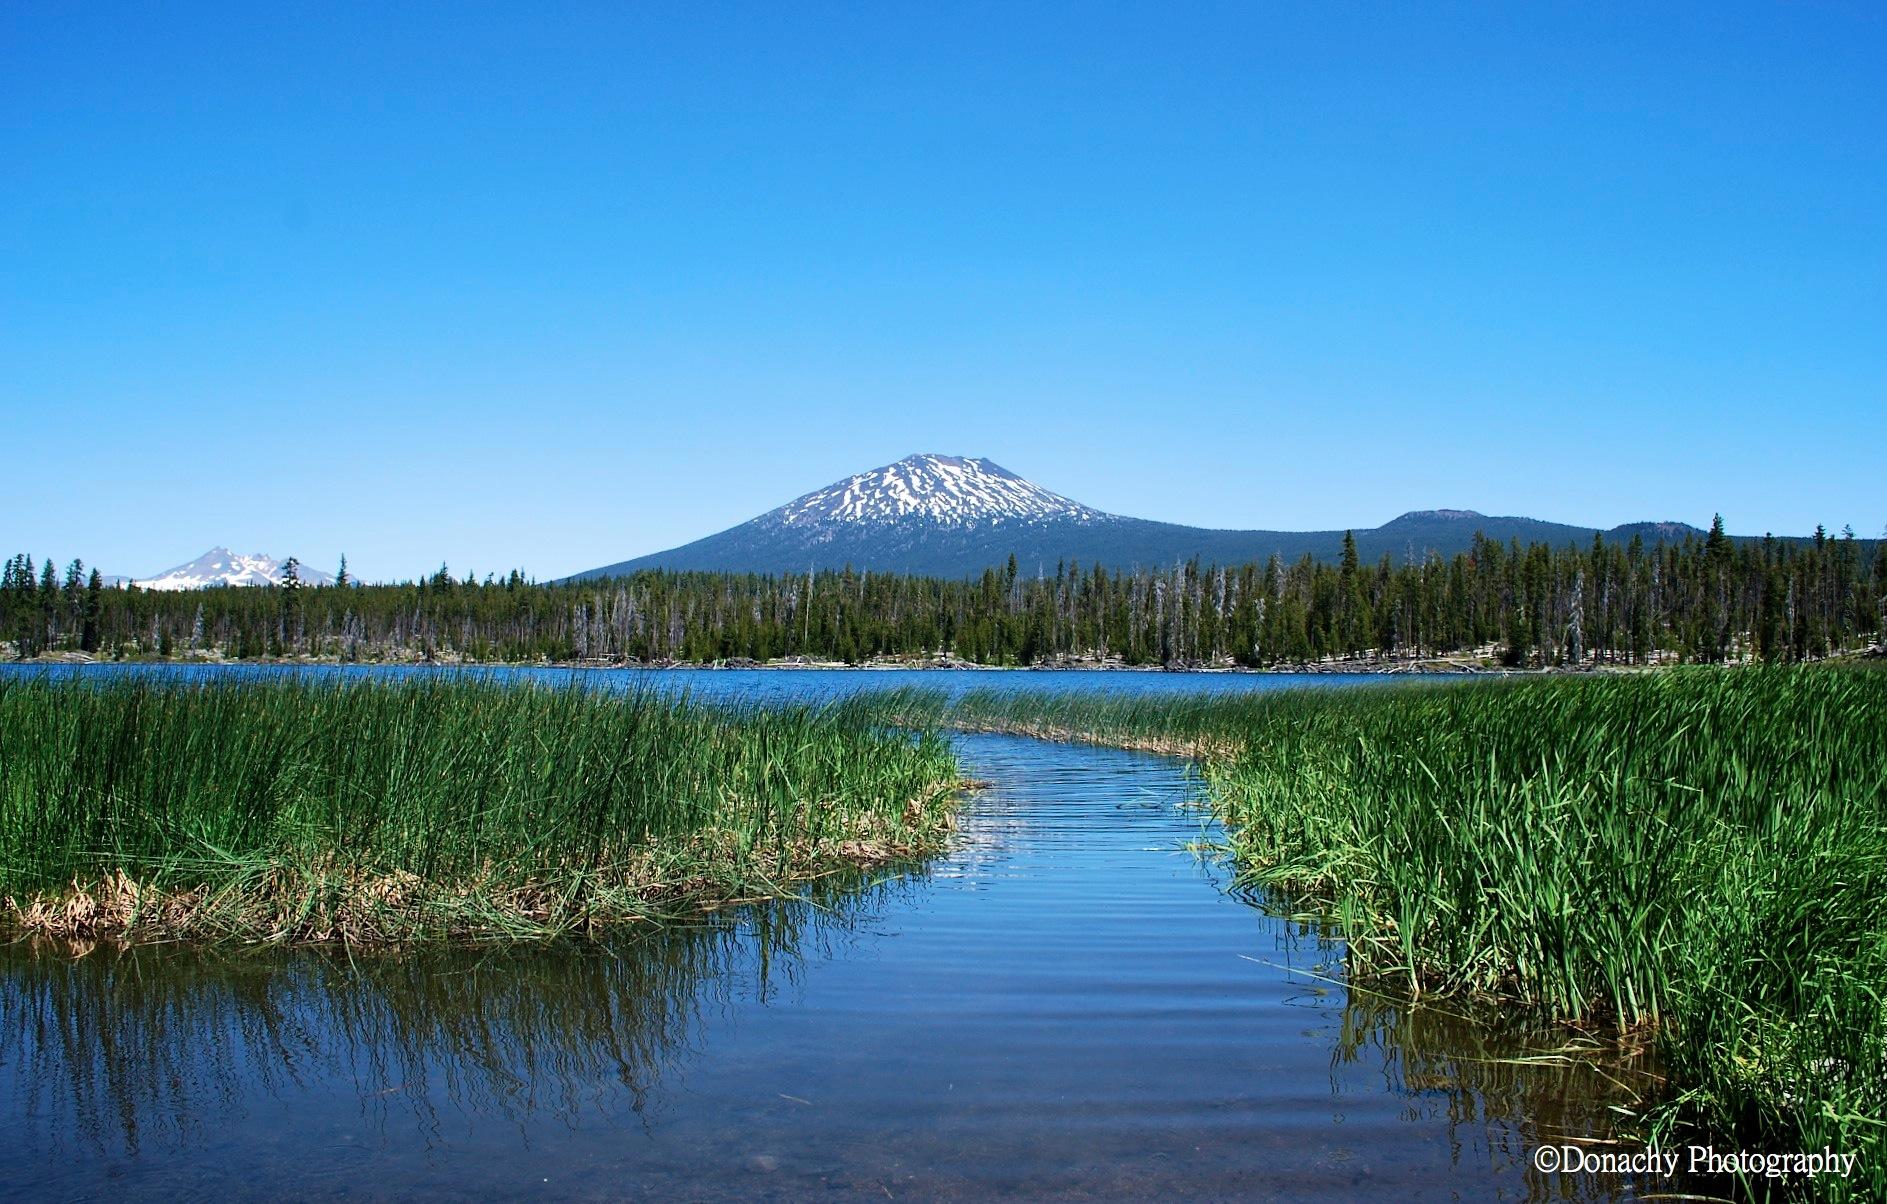 Fishing and Camping along Oregon's Deschutes River ...